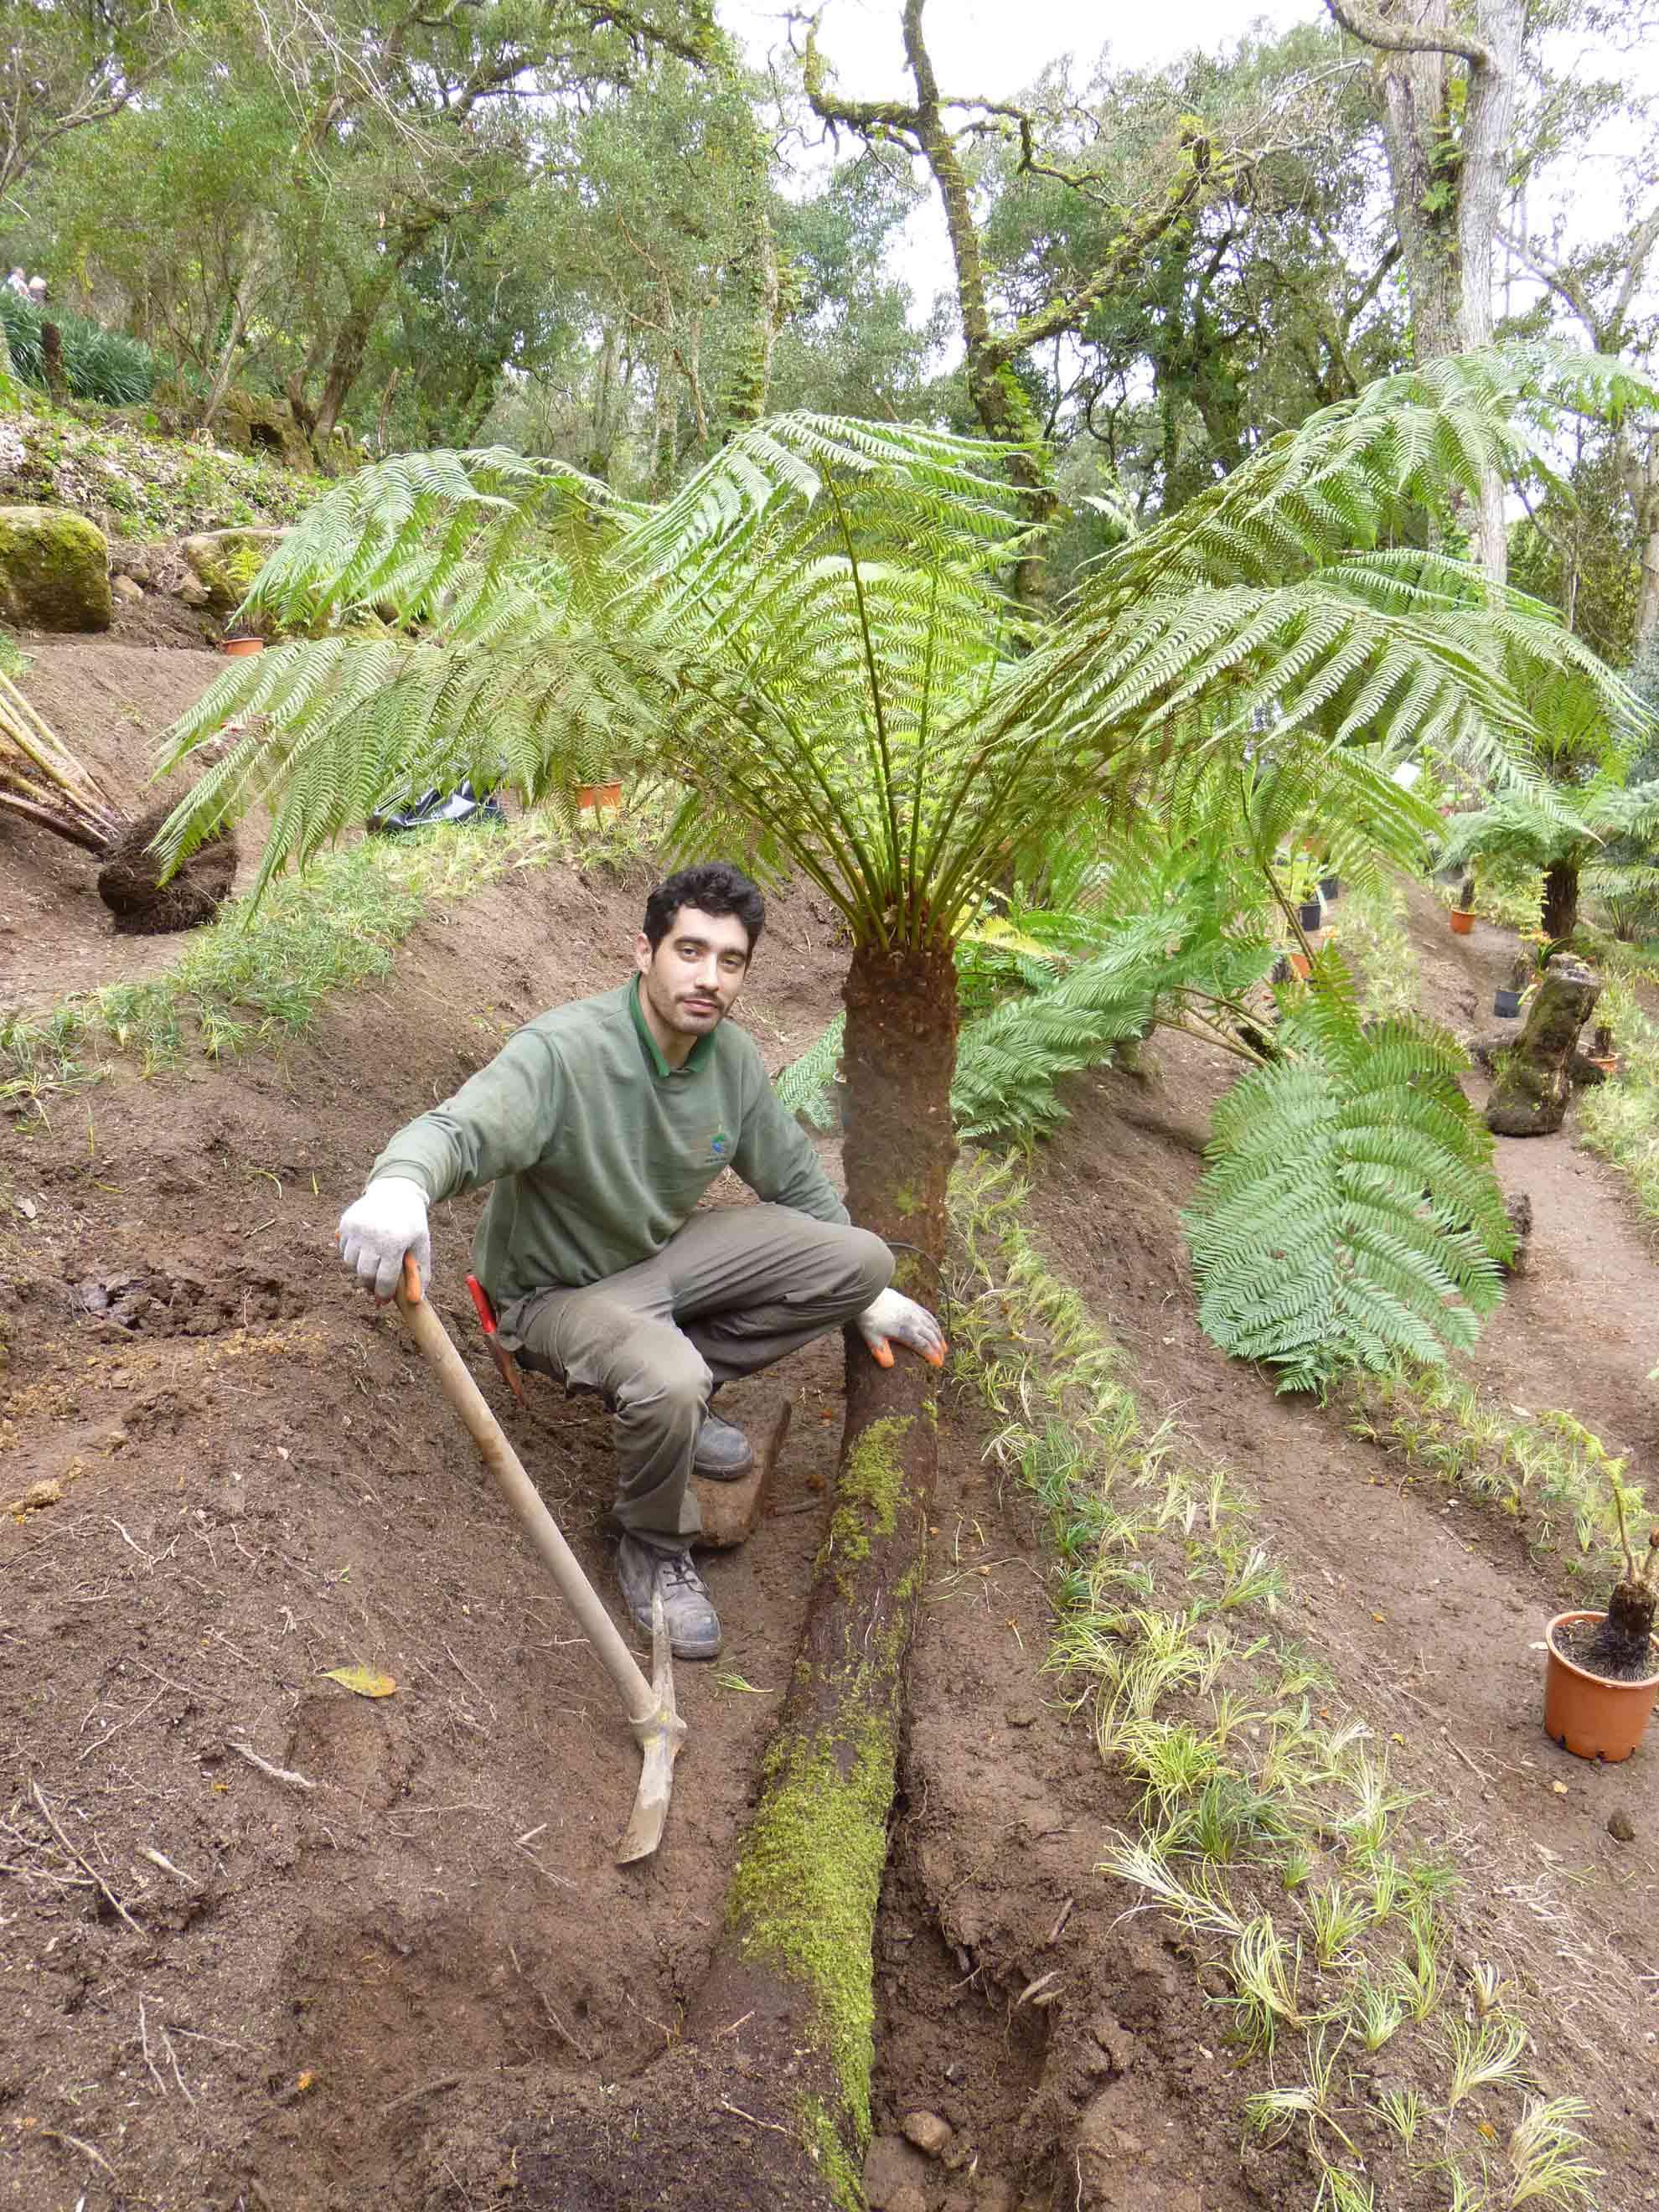 Transplanting an adult specimen of <i>Cyathea dealbata</i> (Sintra, Portugal)